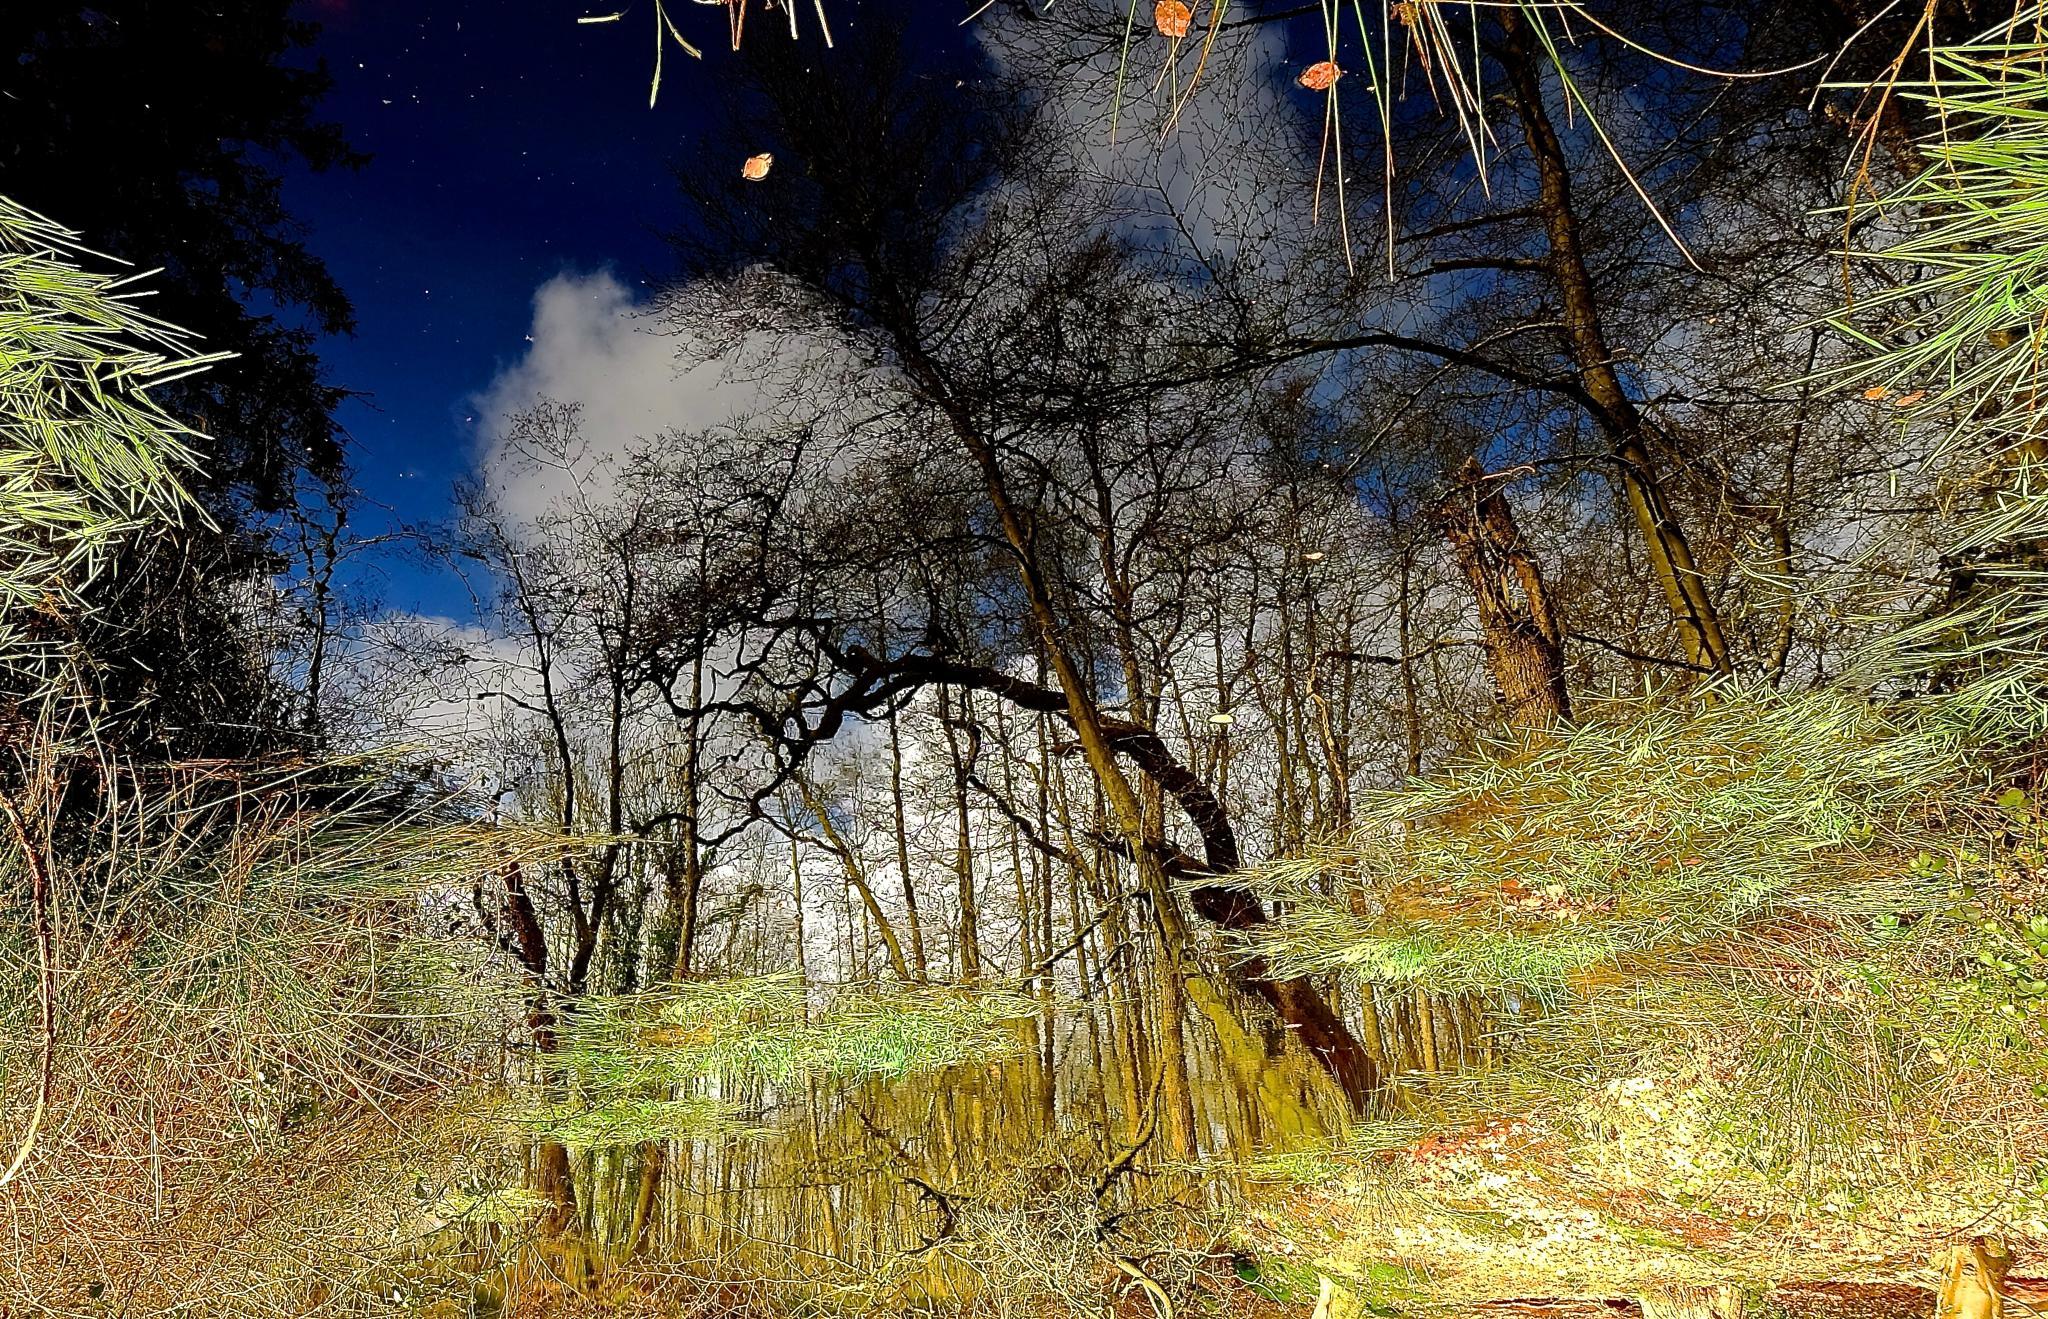 Mirror by Ropje